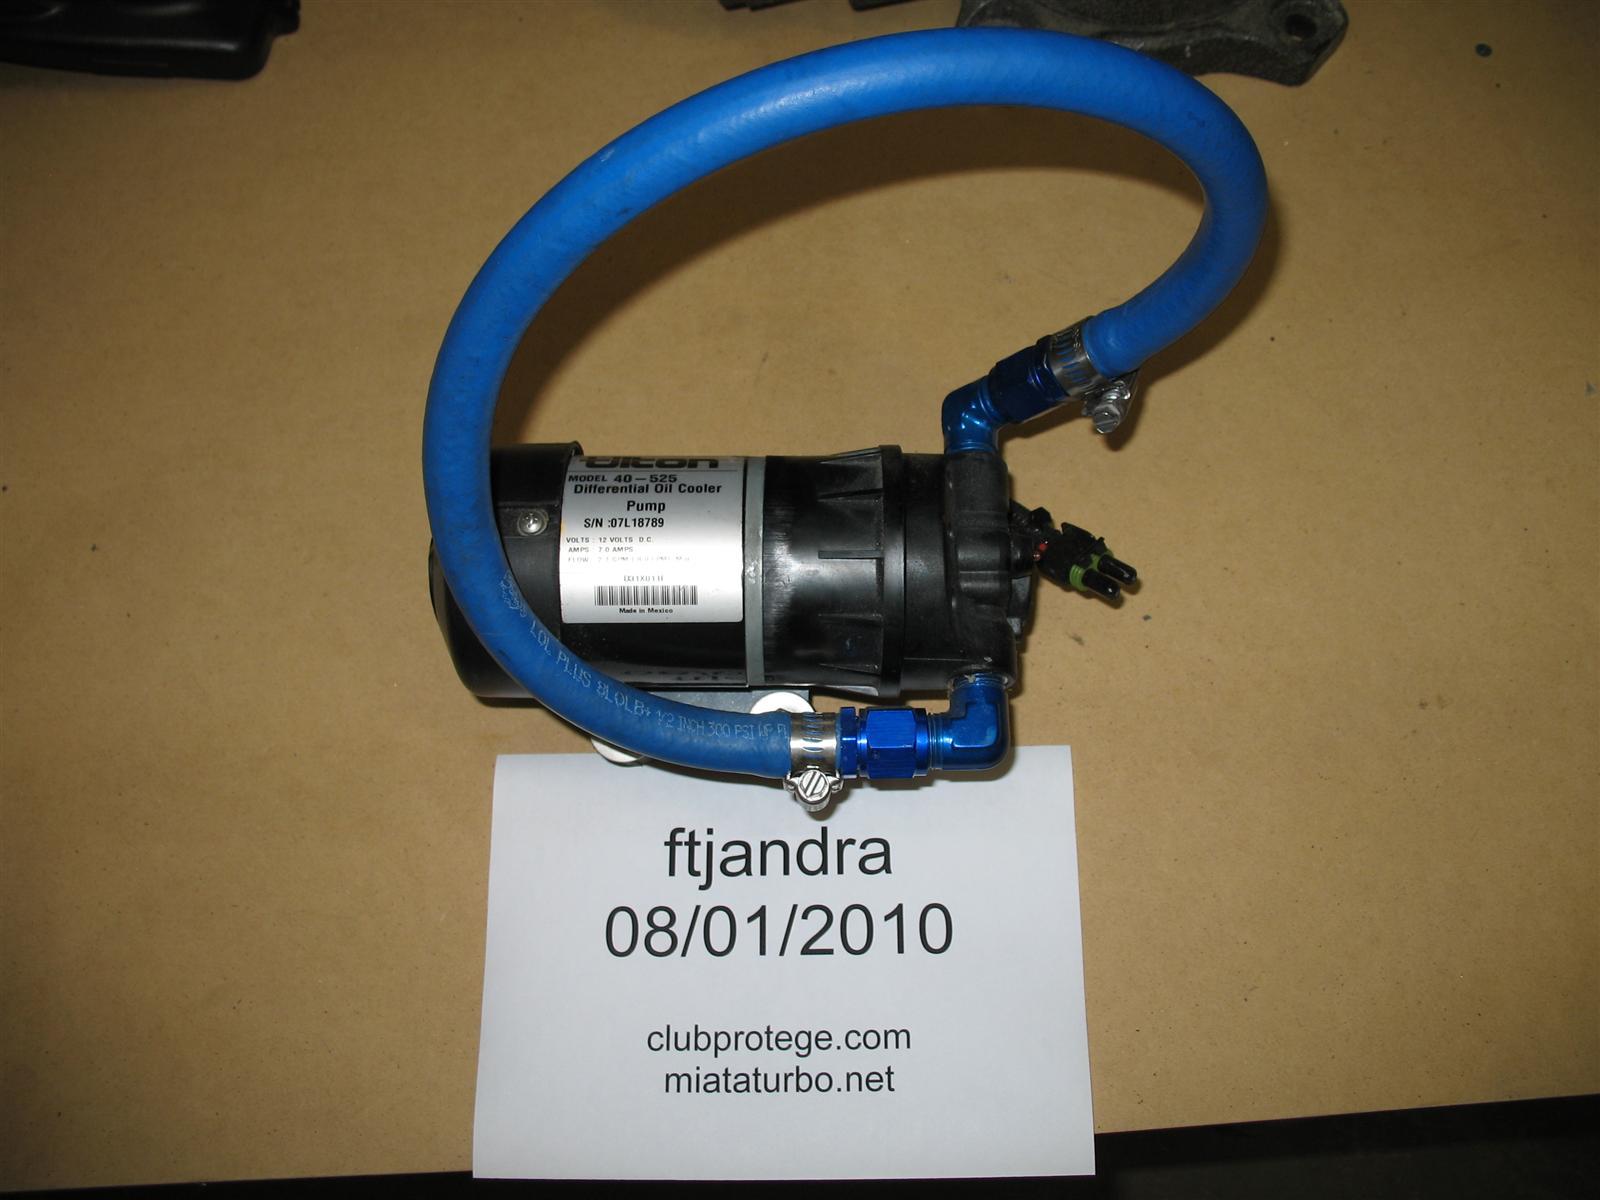 Tilton Racing 40-524 Oil/Water Cooler Pump Replacement Parts ...